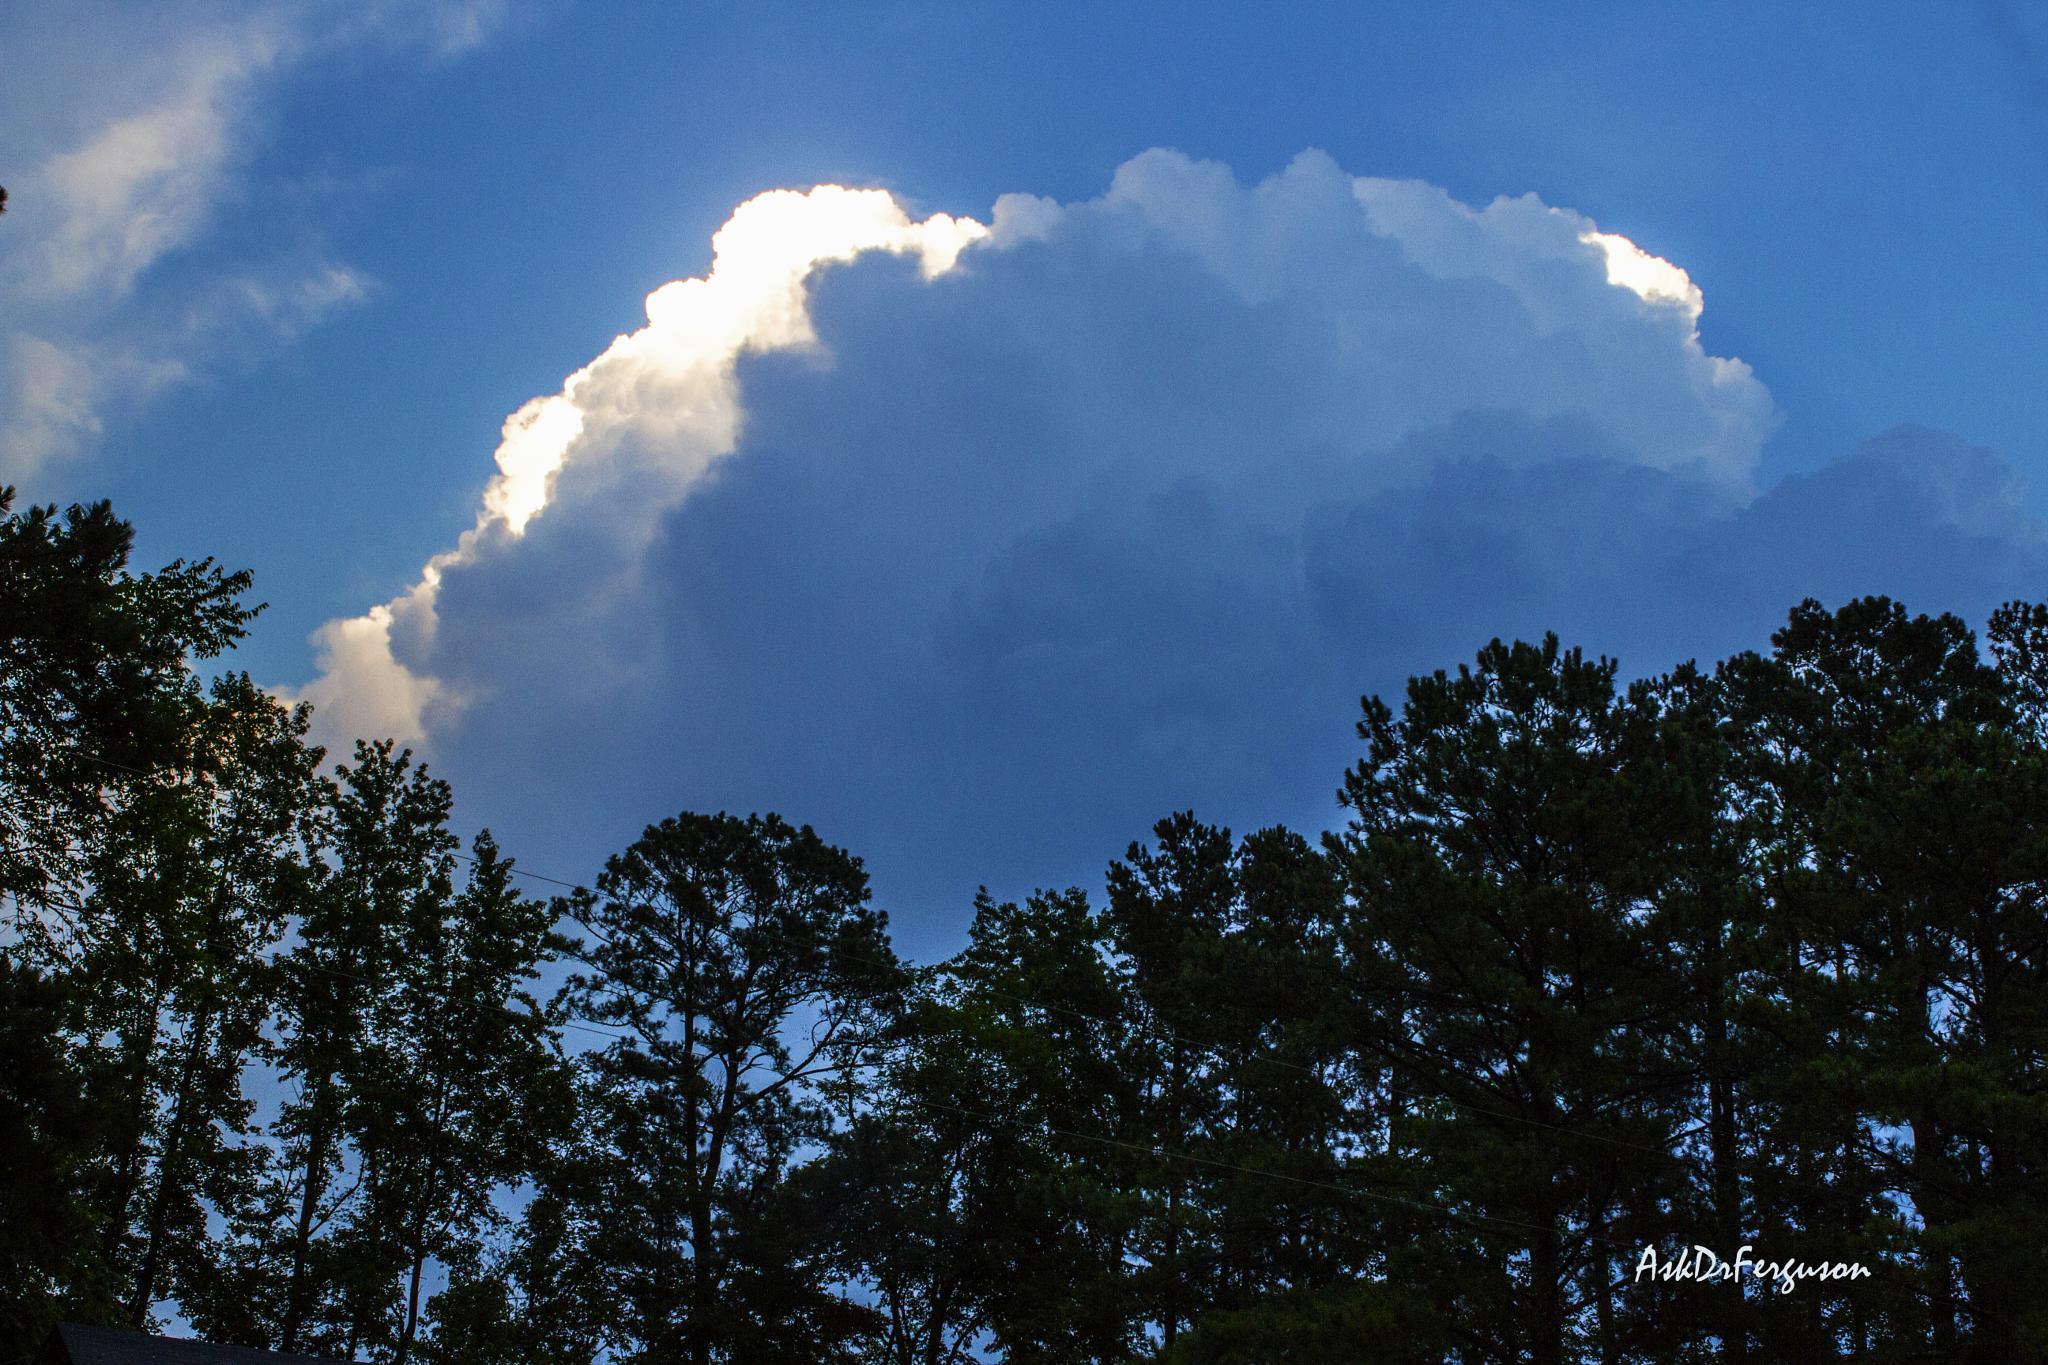 Even Clouds by askdrferguson